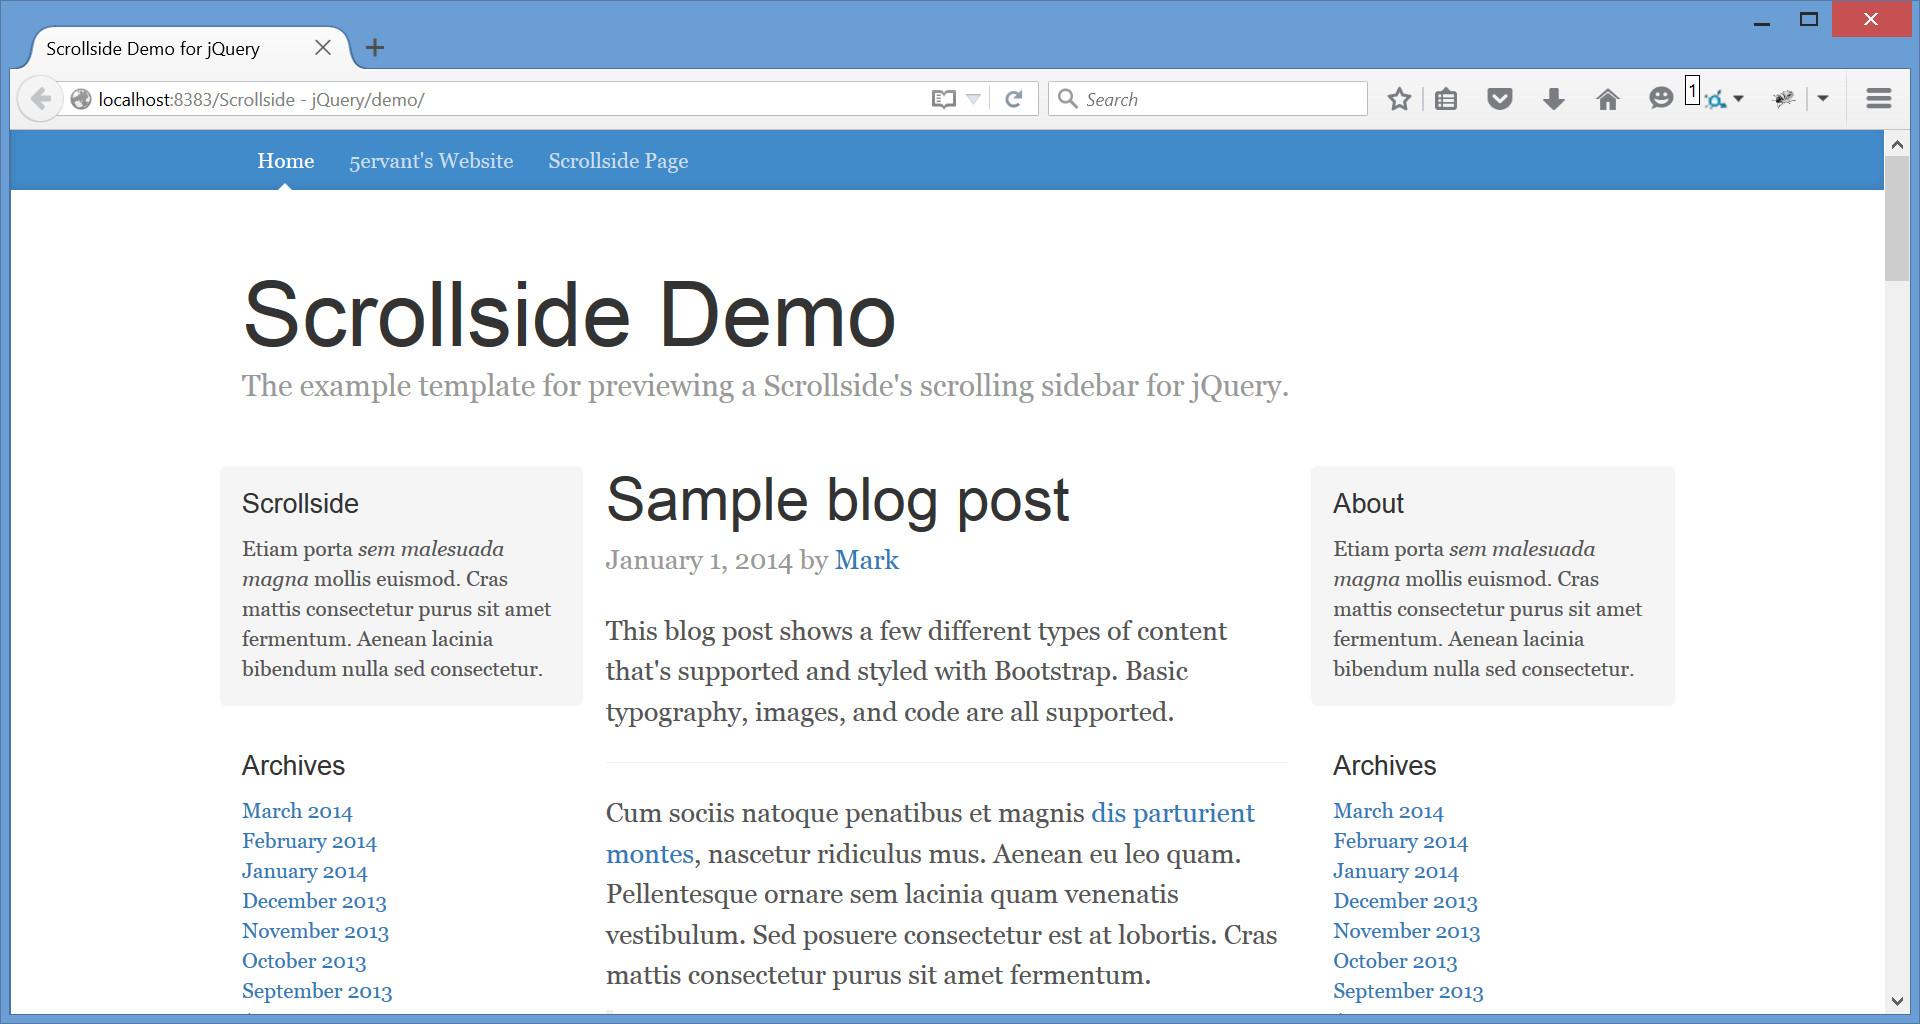 Documentation of Scrollside for jQuery